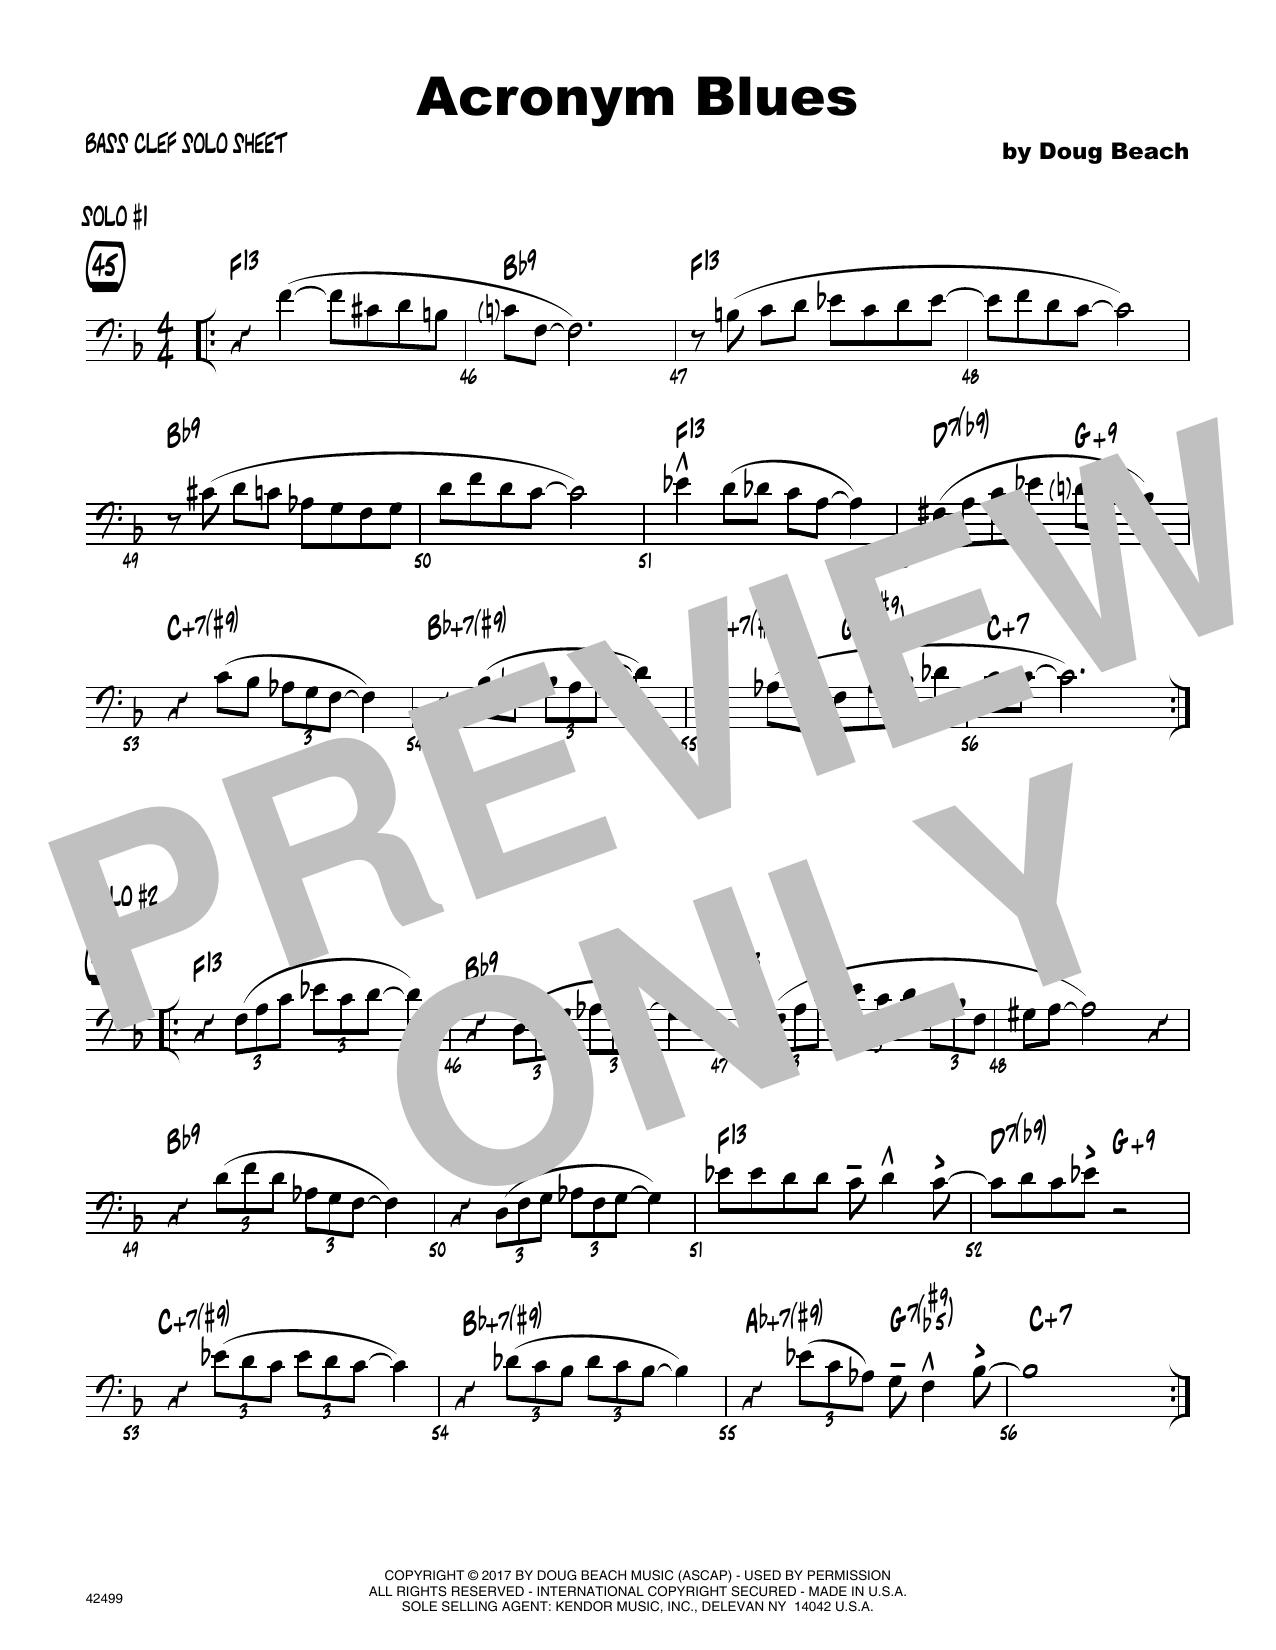 Acronym Blues - Solo Sheet - Trombone Sheet Music